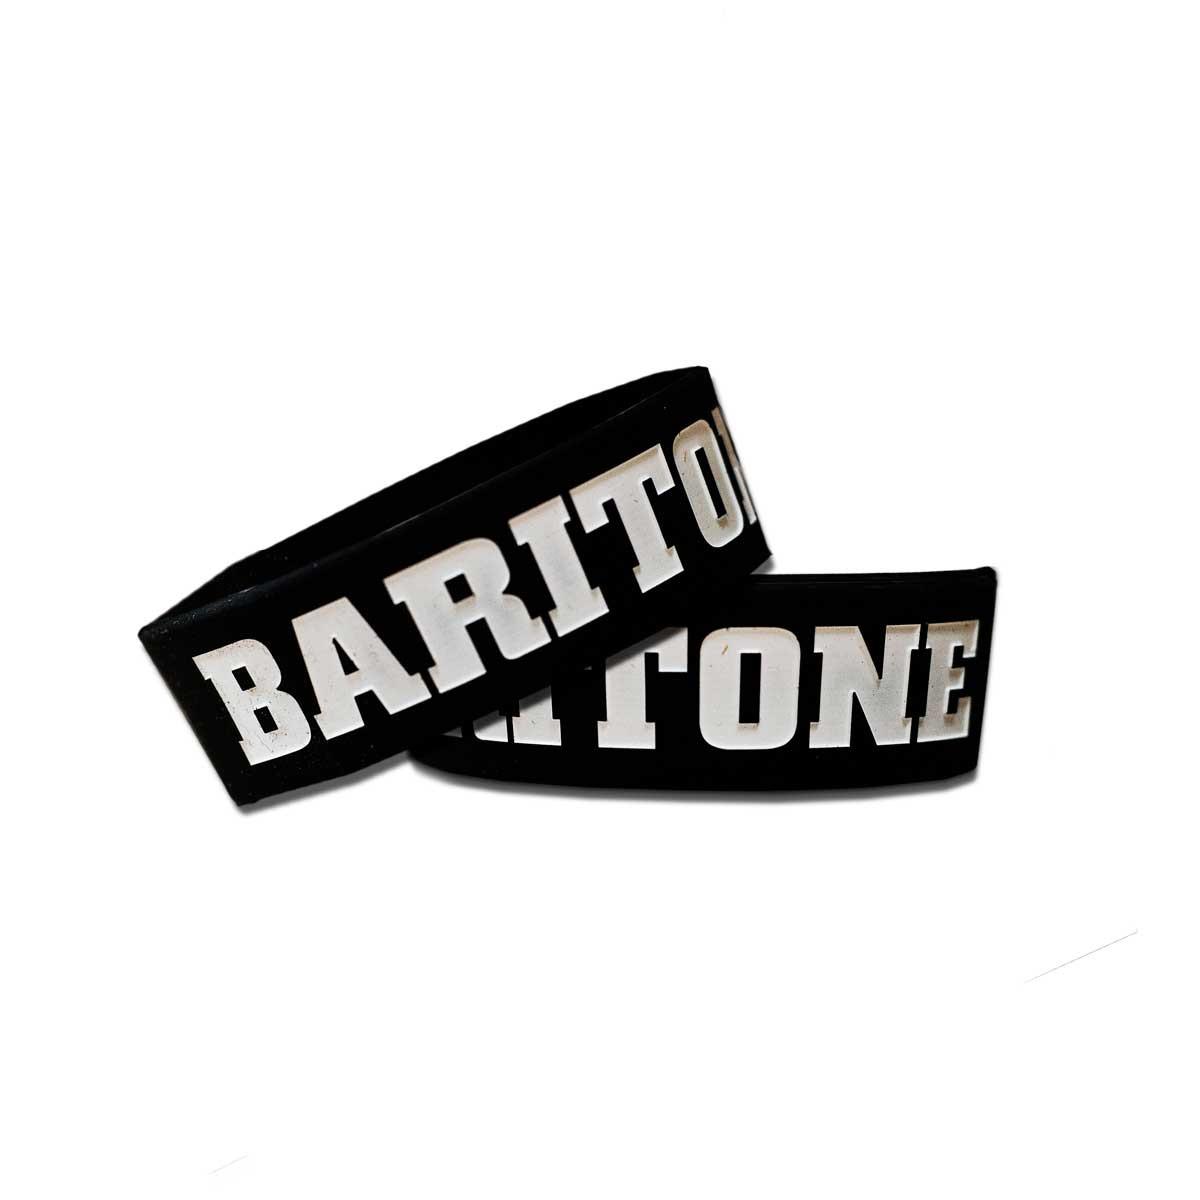 Baritone Wristband